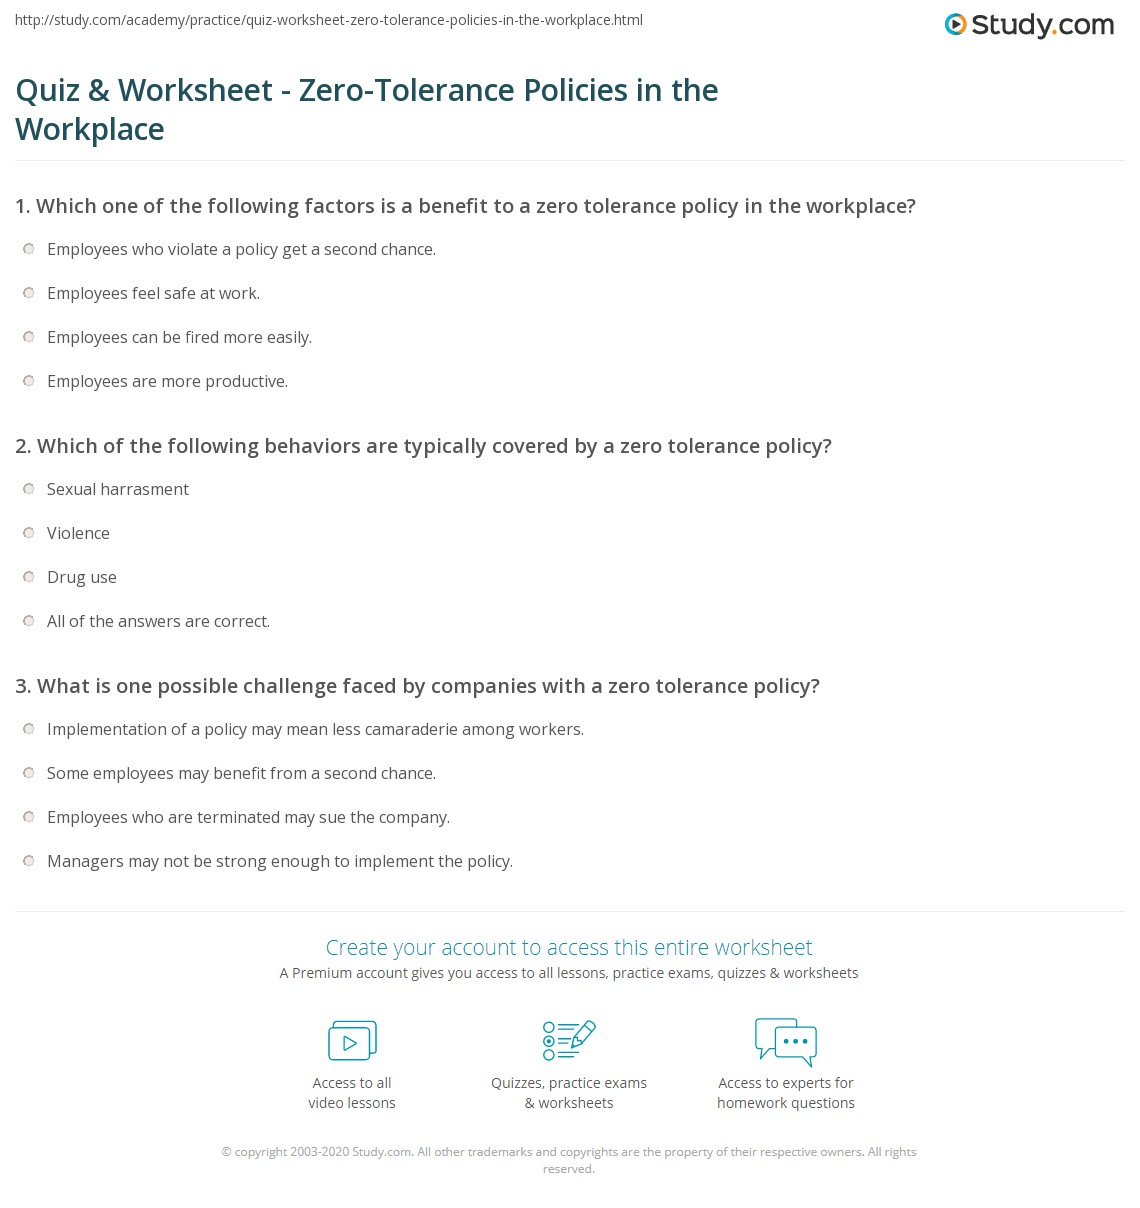 Quiz Worksheet Zero Tolerance Policies In The Workplace Study